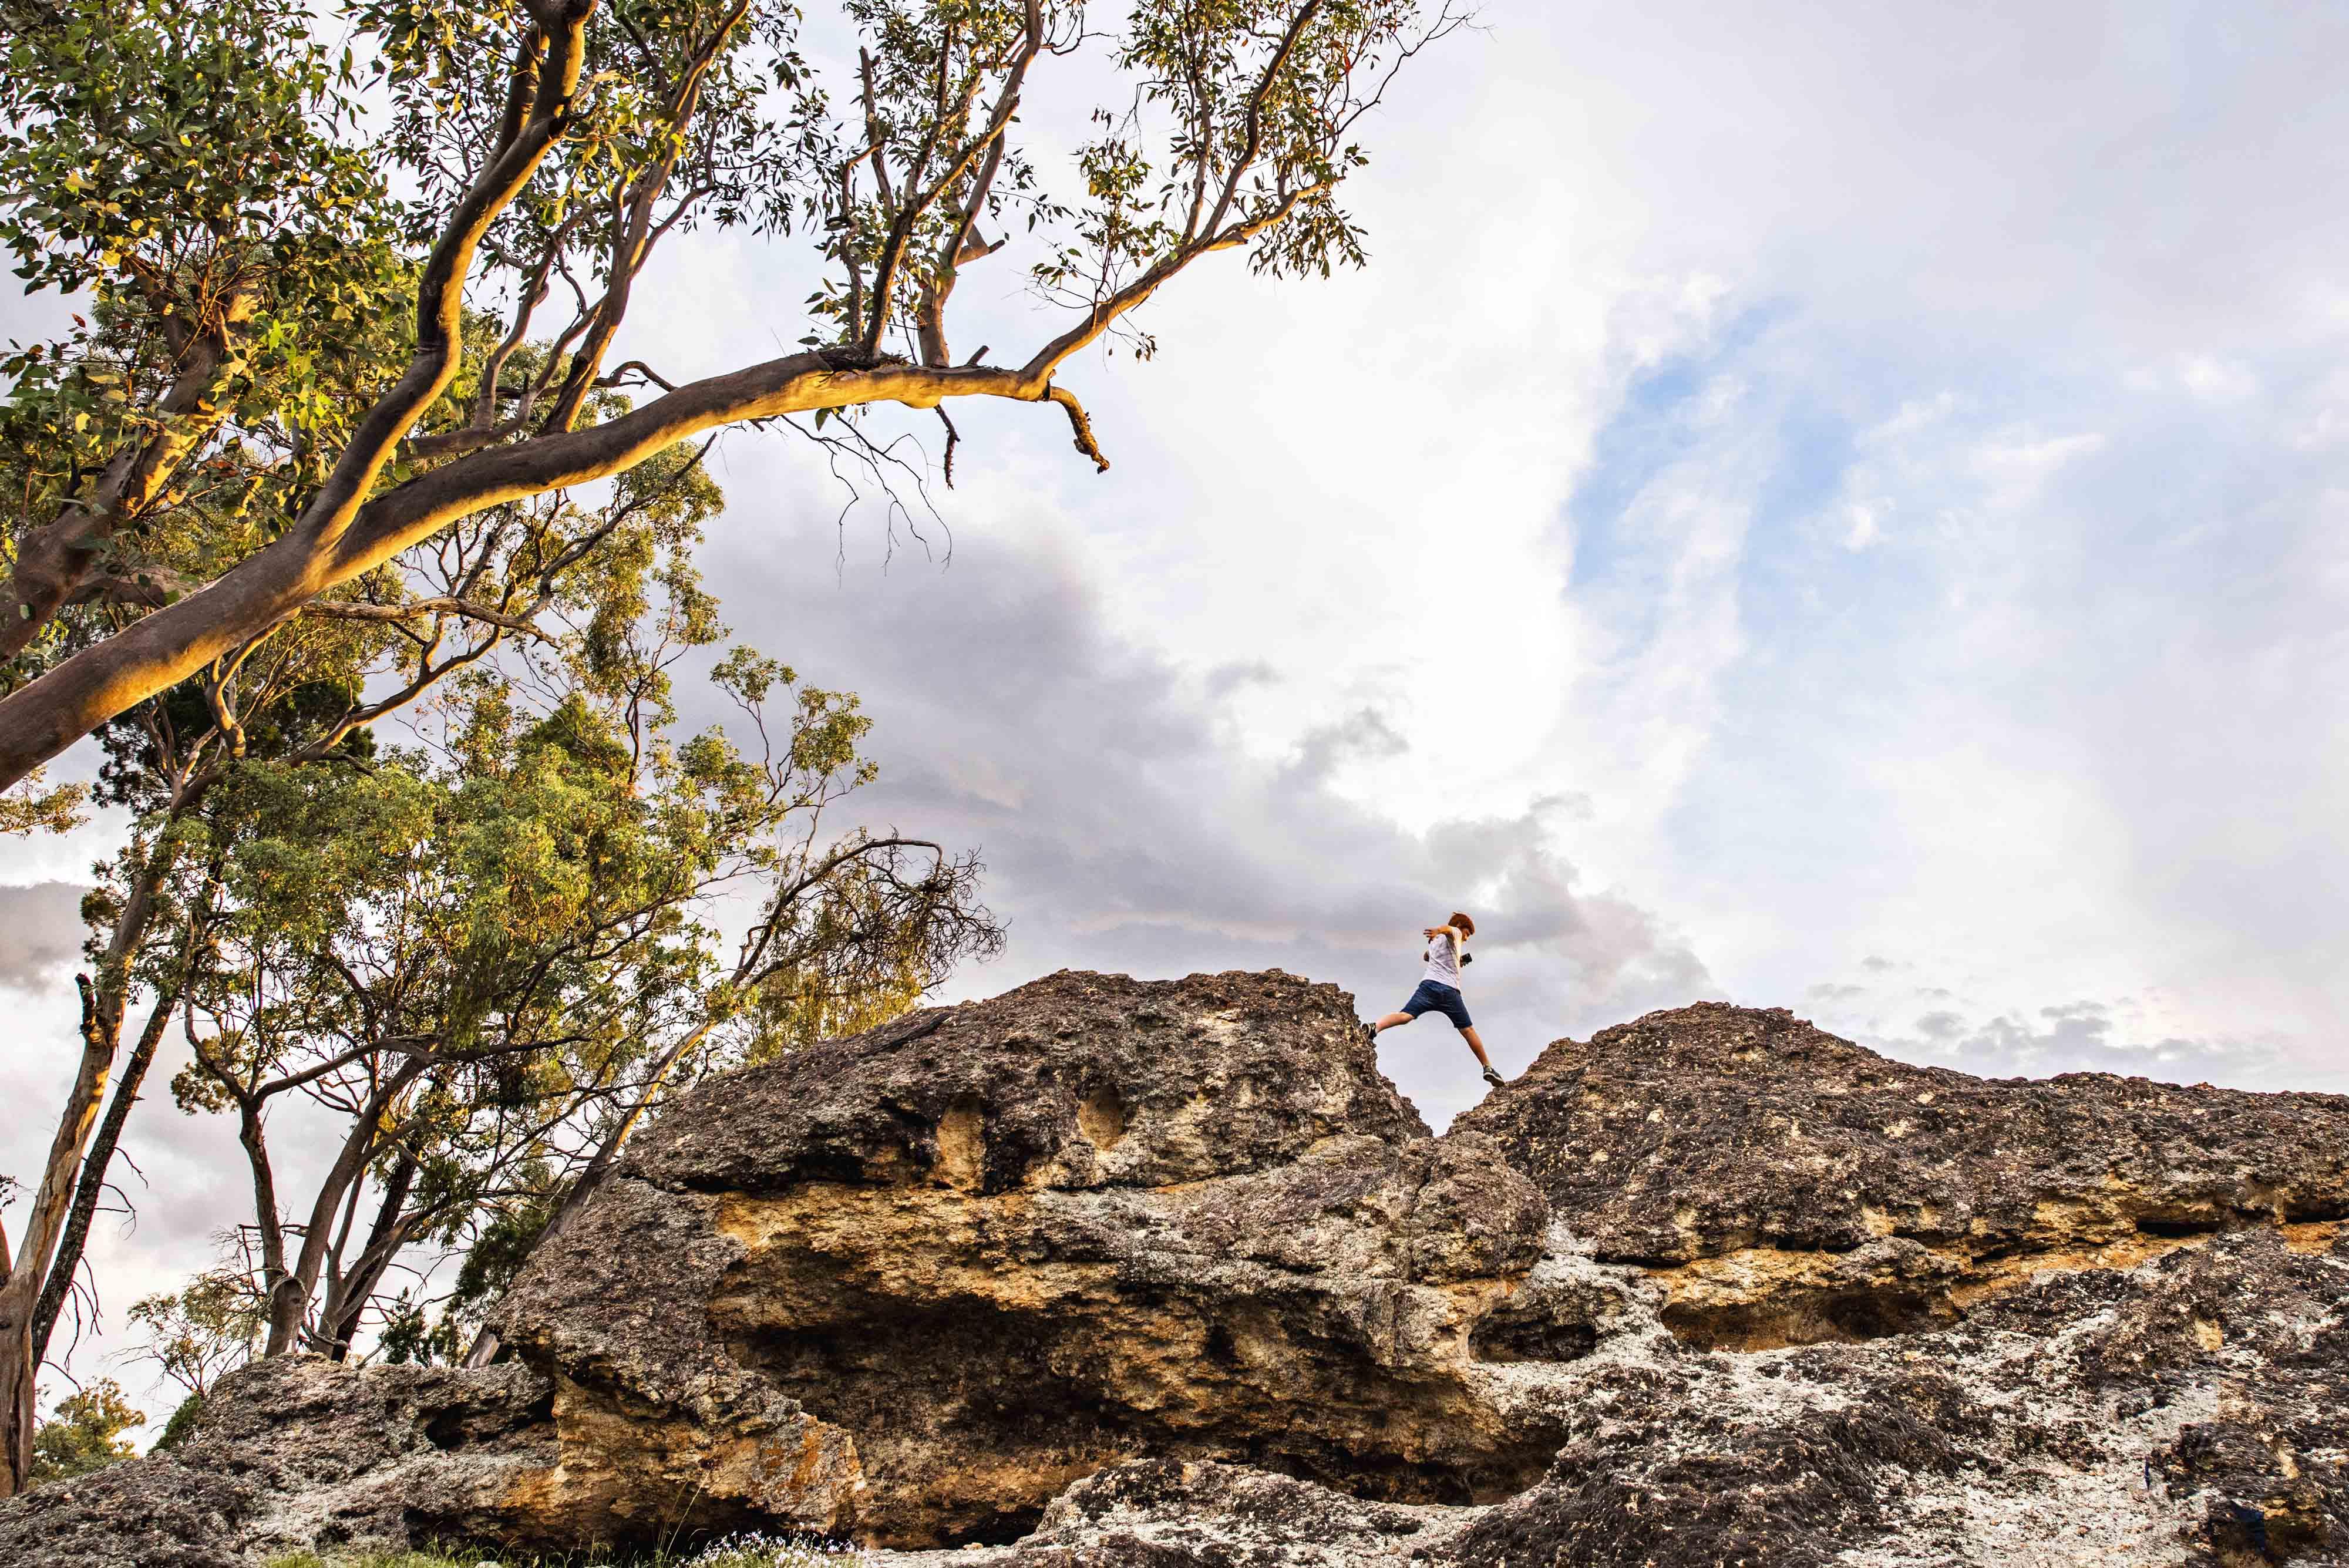 odd frog lodges lue nature rocks caves mudgee walking sunset